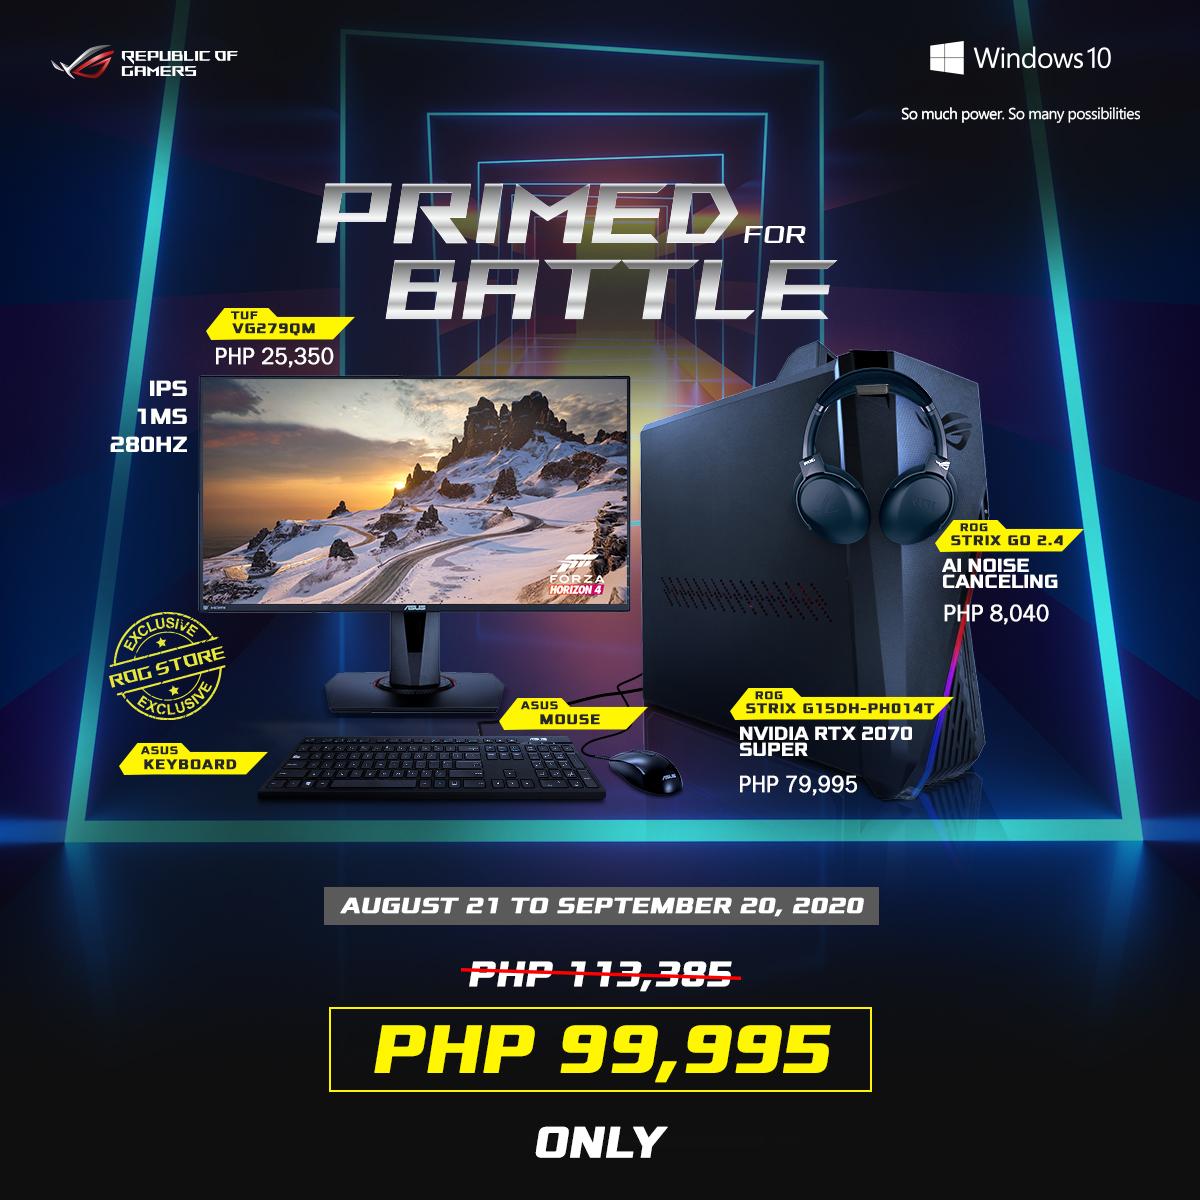 G15DH-PH014T Full Setup Promo